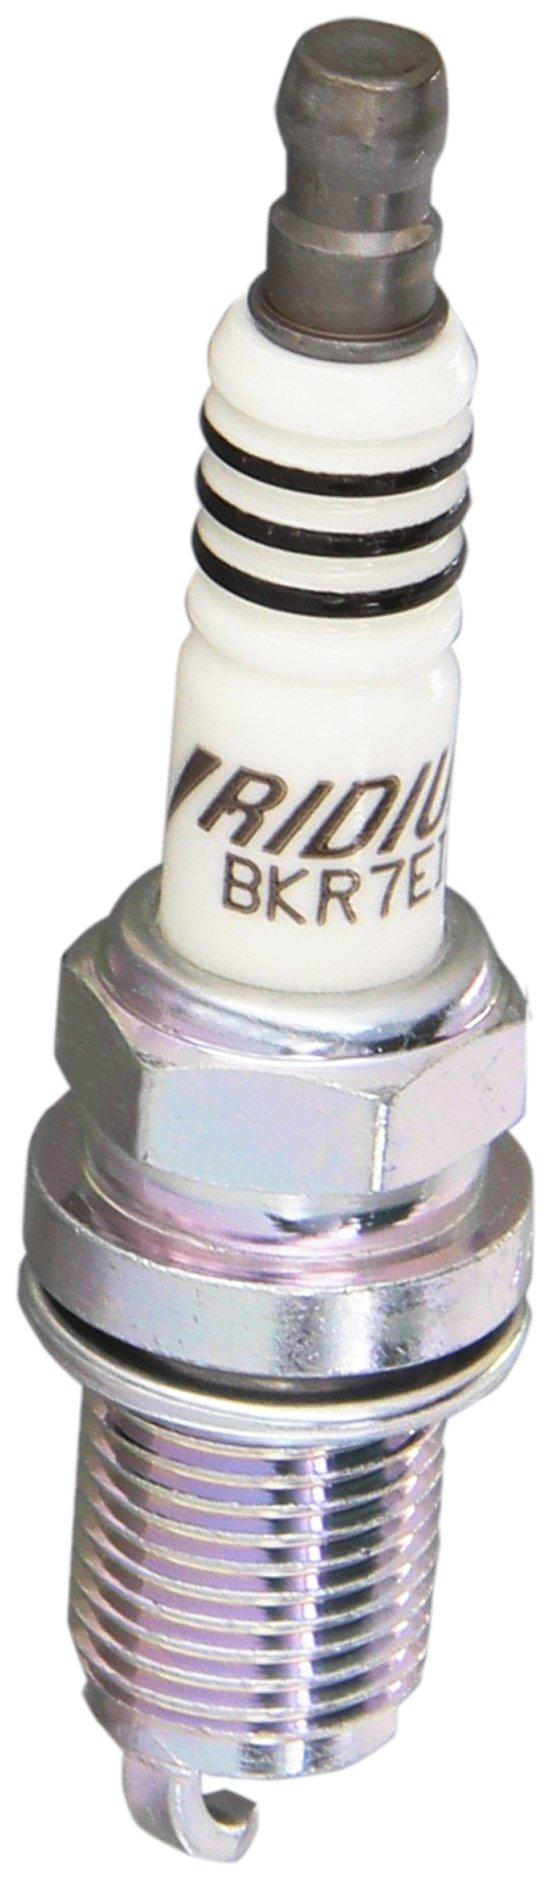 NGK 2667 BKR7EIX Iridium IX Spark Plug, Pack of 4